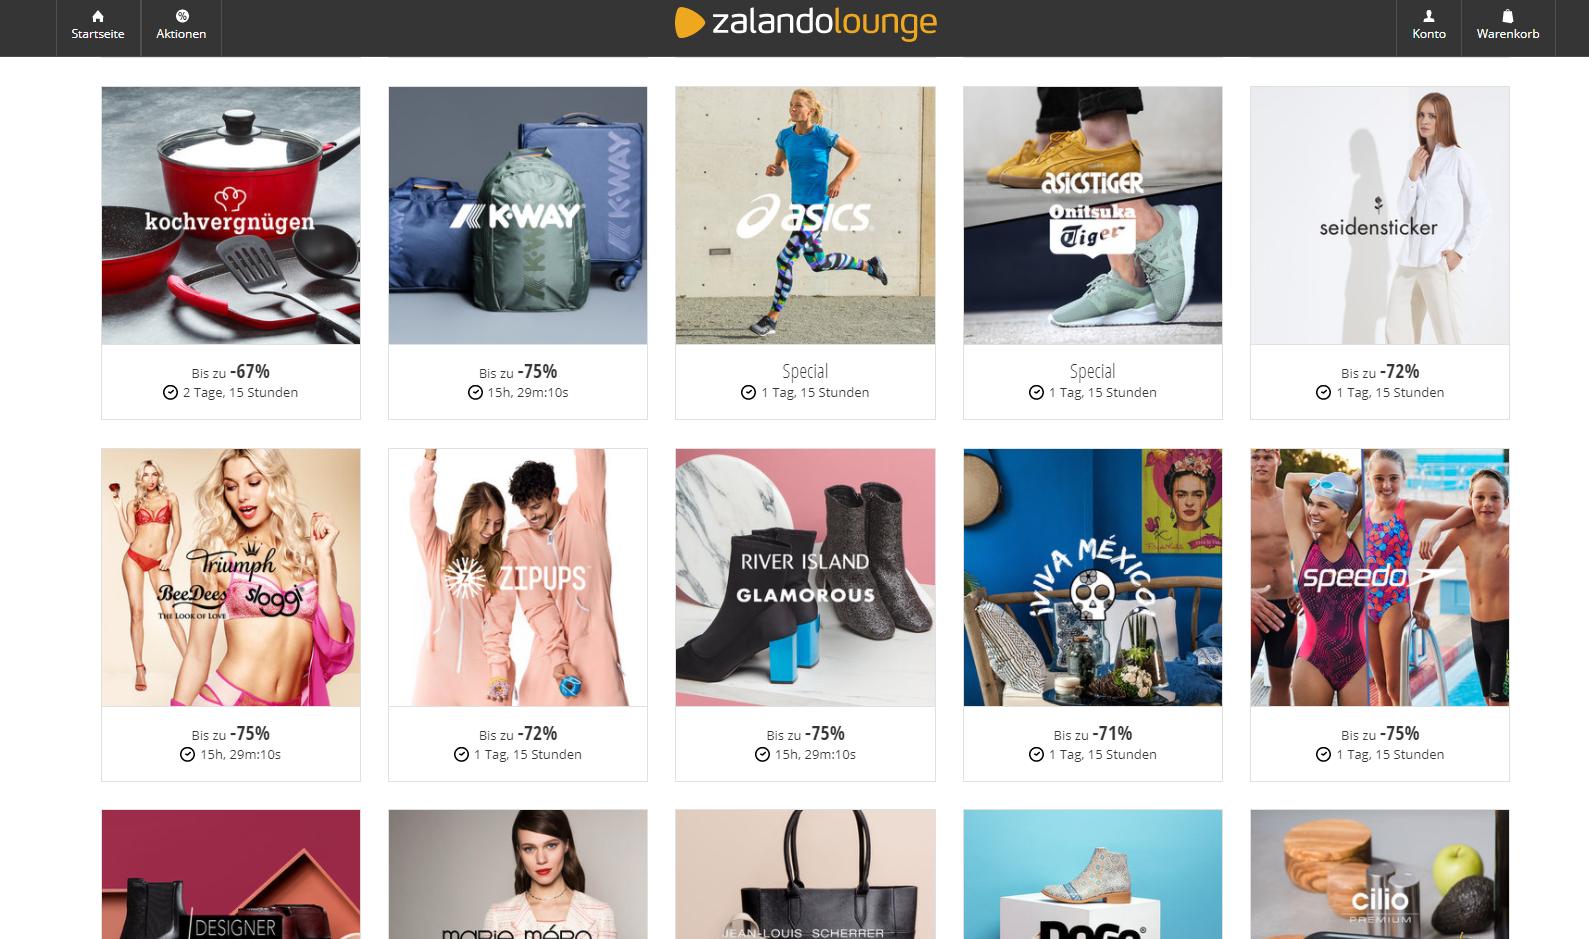 Zalando Lounge Angebote